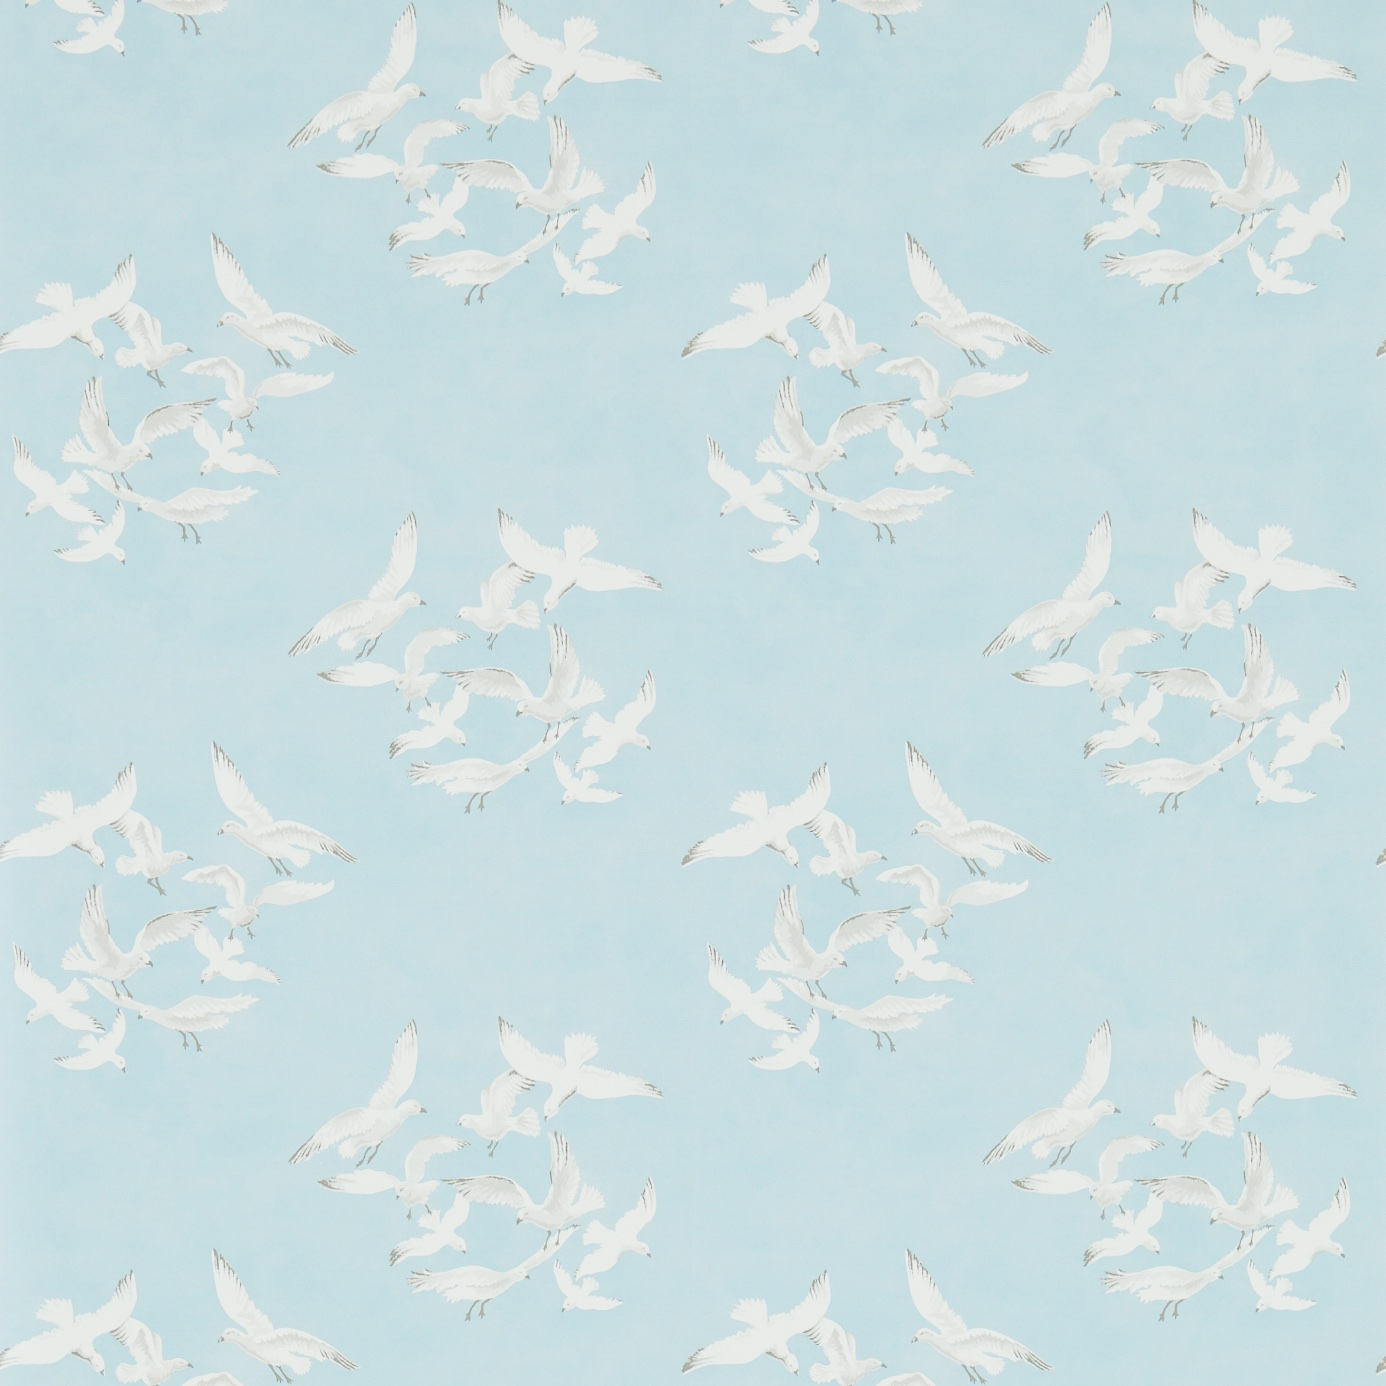 Seagulls-214585